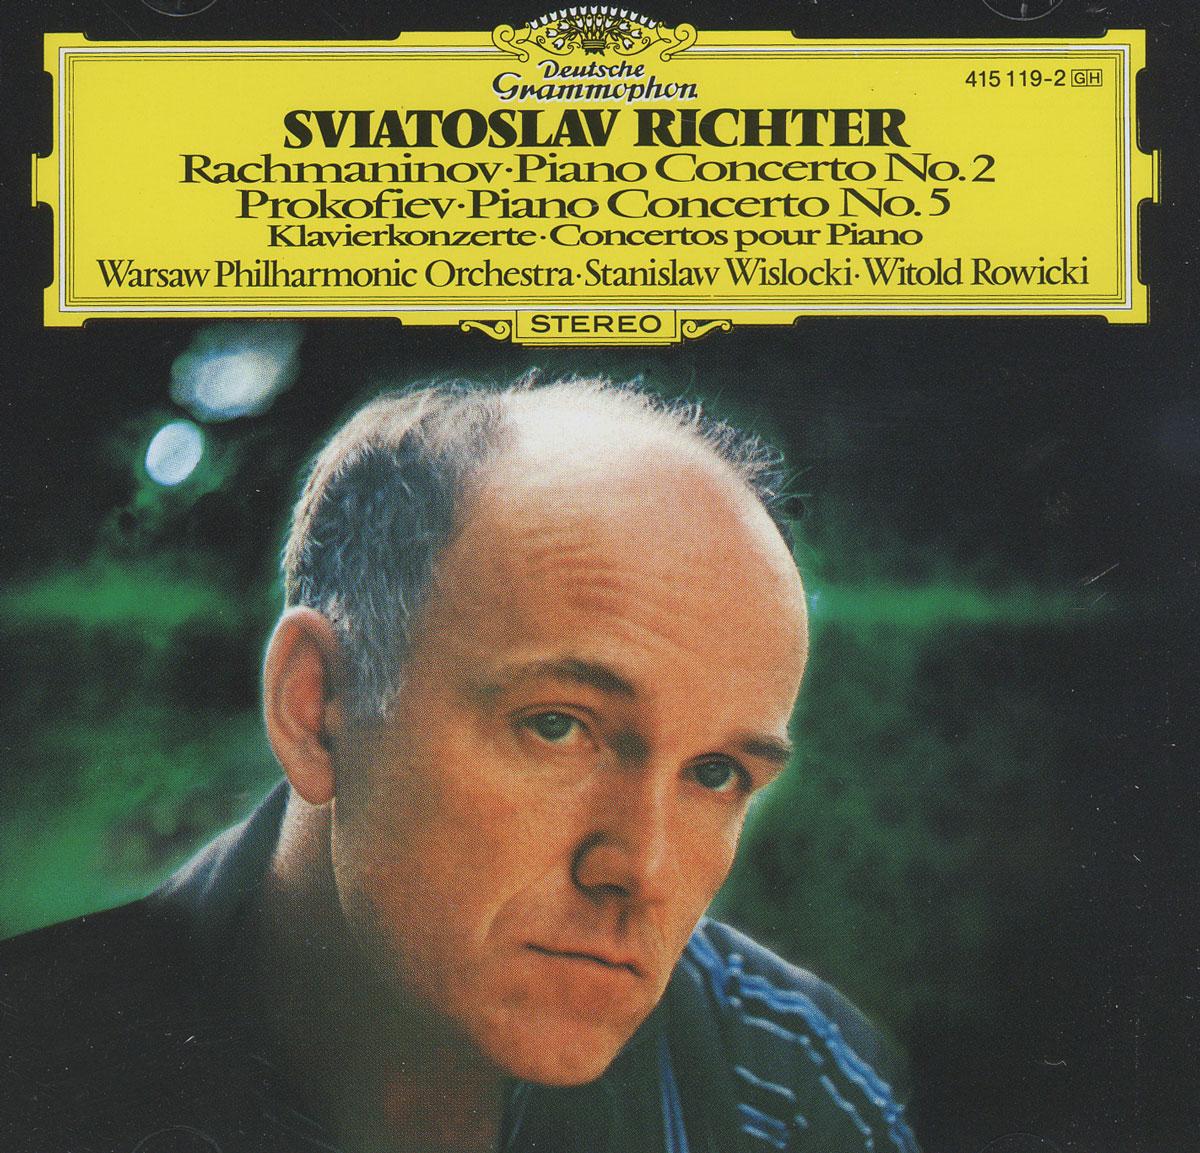 Sergei Rachmaninov. Piano Concerto No. 2 / Sergei Prokofiev. Piano Concerto No. 5. Sviatoslav Richter святослав рихтер sviatoslav richter piano s rachmaninov etudes tableaux from op 33 and op 39 six prelides from op 23 seven preludes from op 32